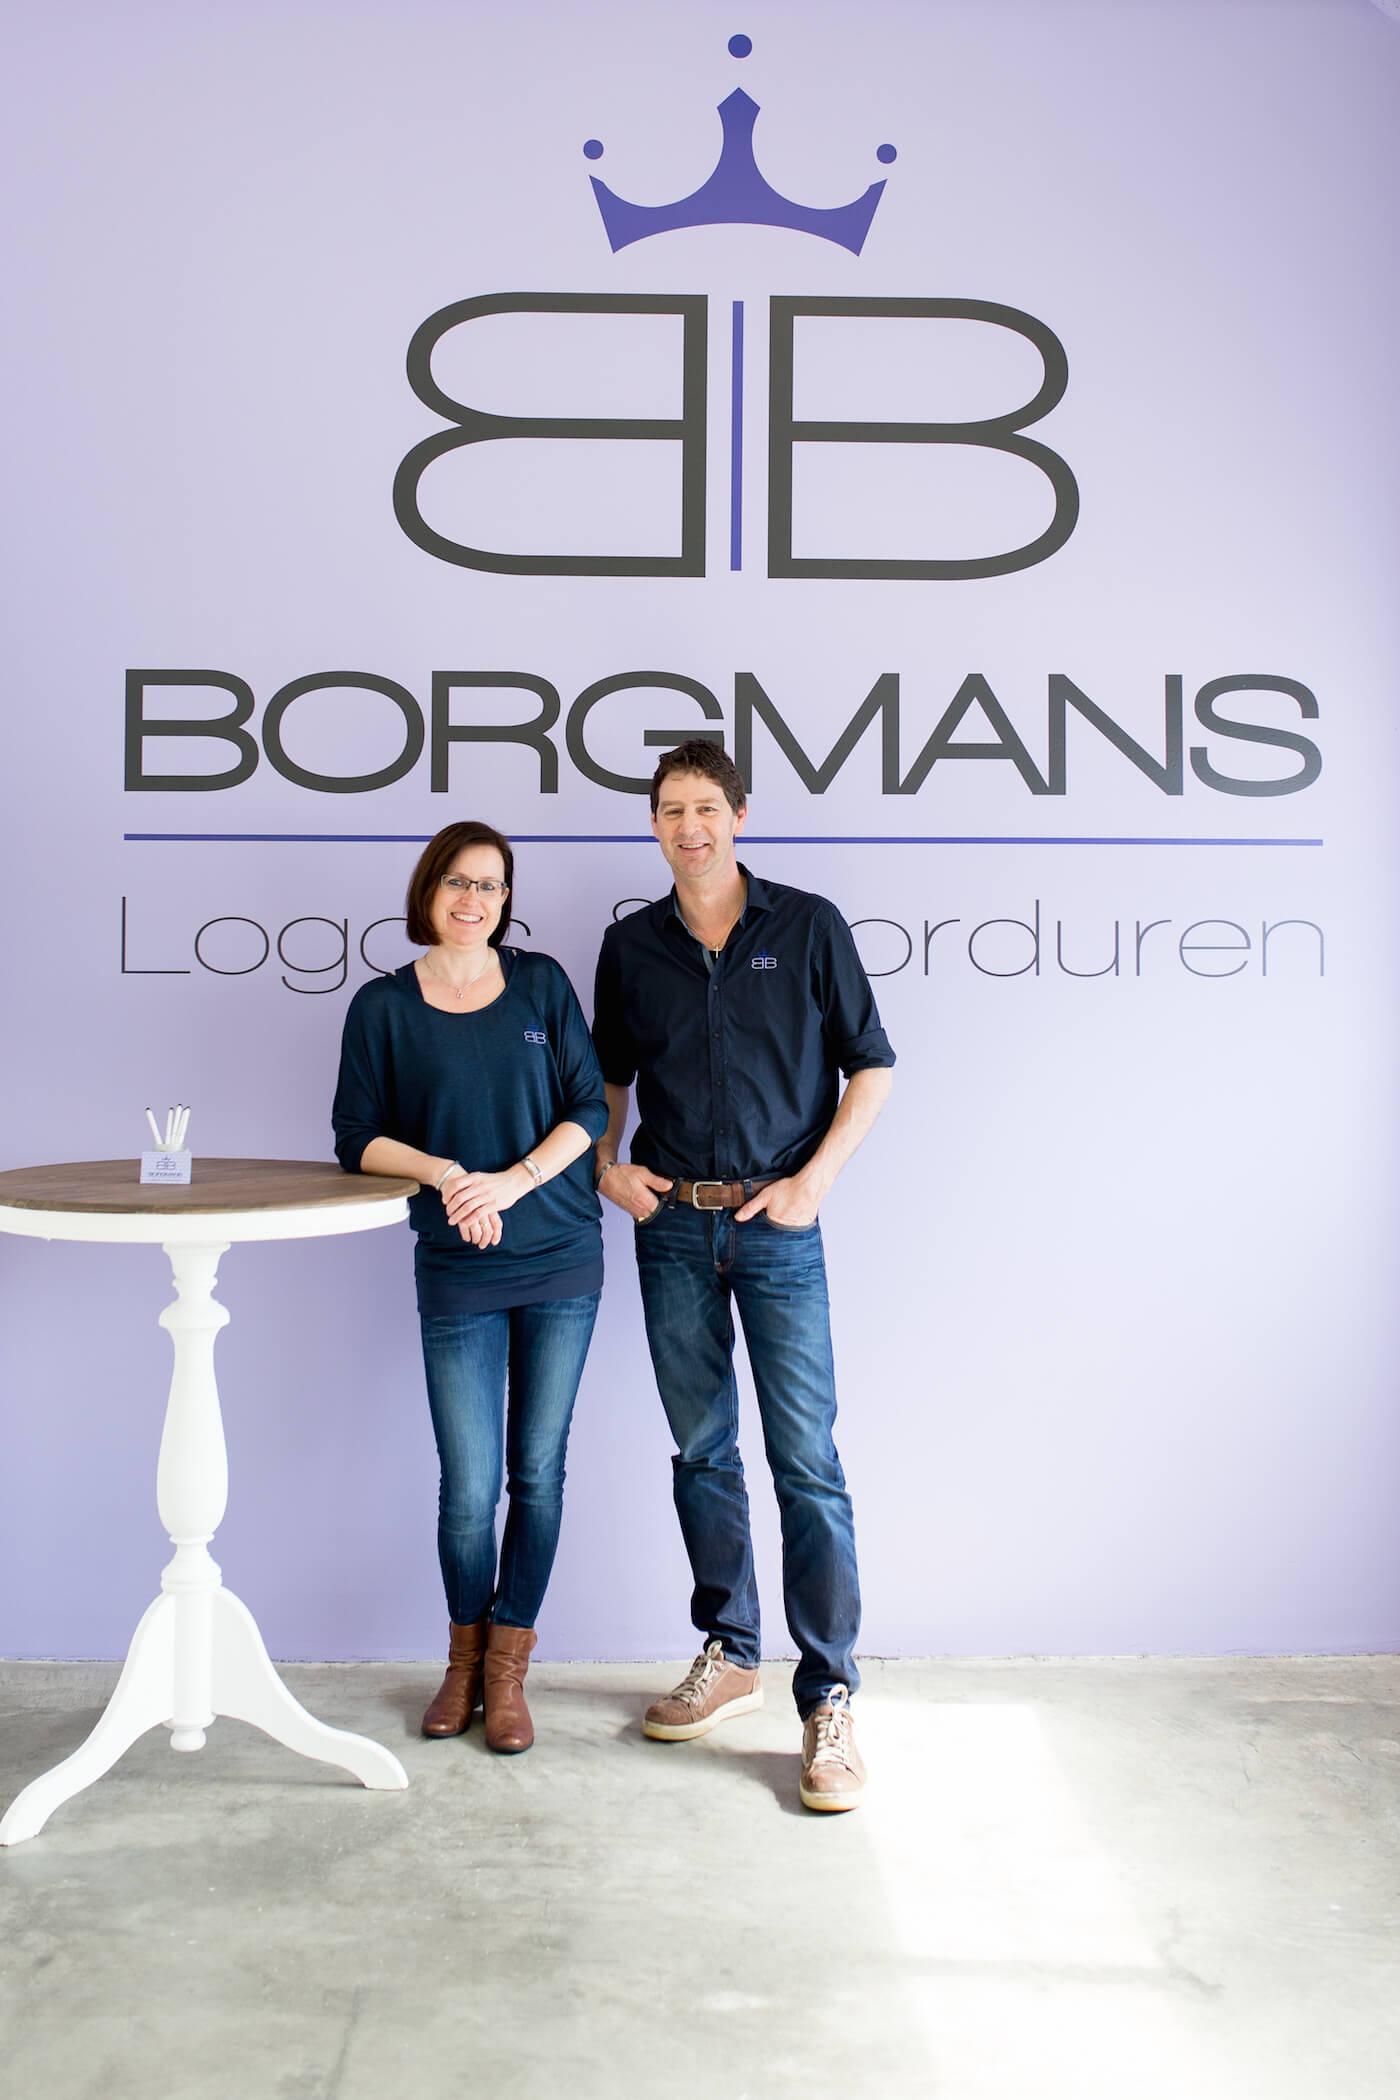 Borgmans Borduren